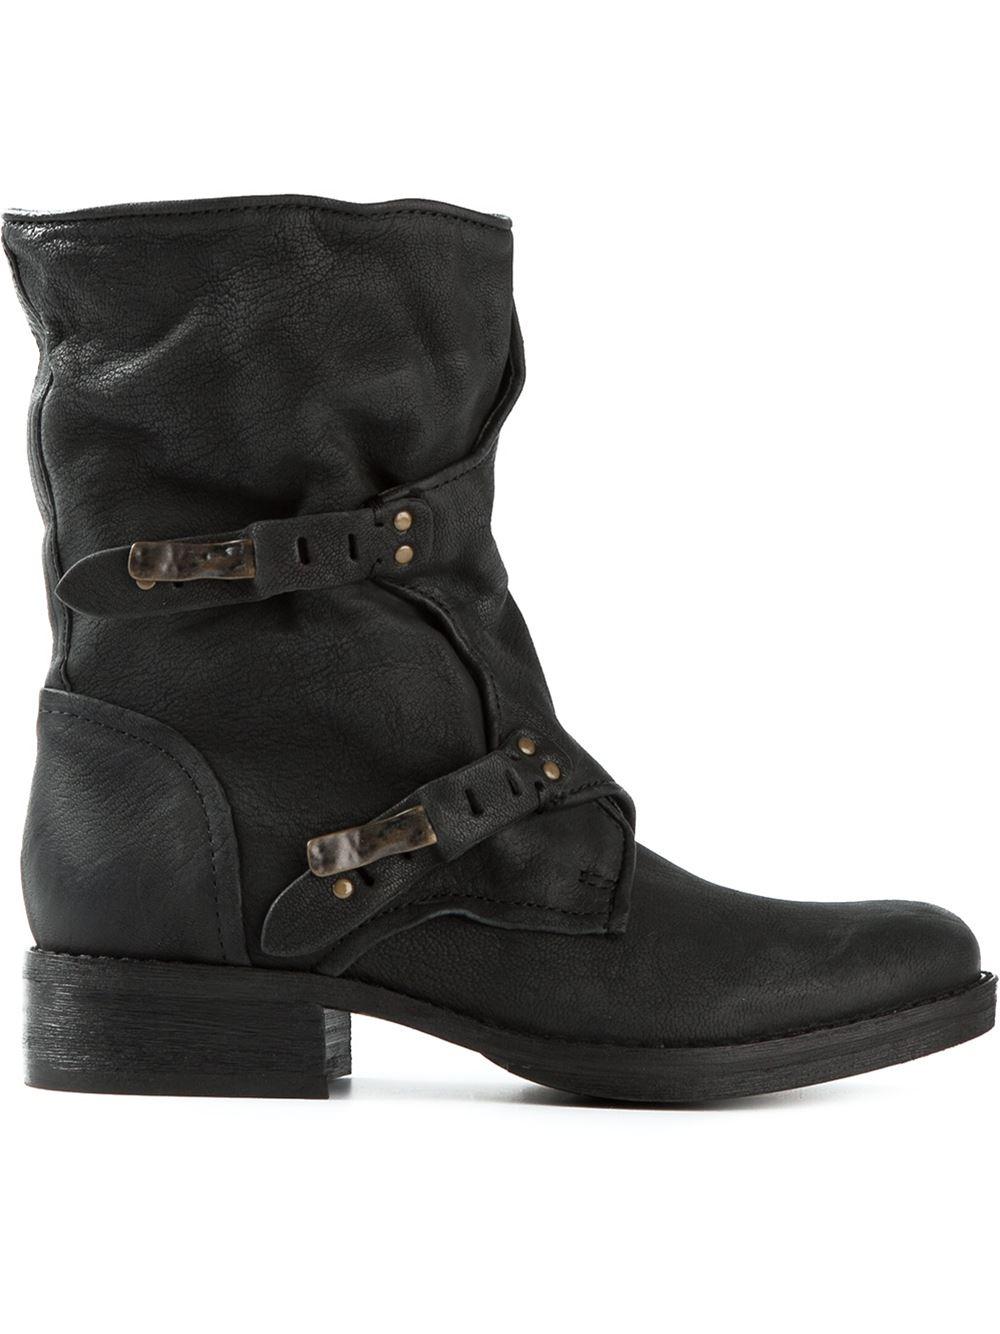 af5c54e89576 Lyst - Sam Edelman  Ridge  Boots in Black